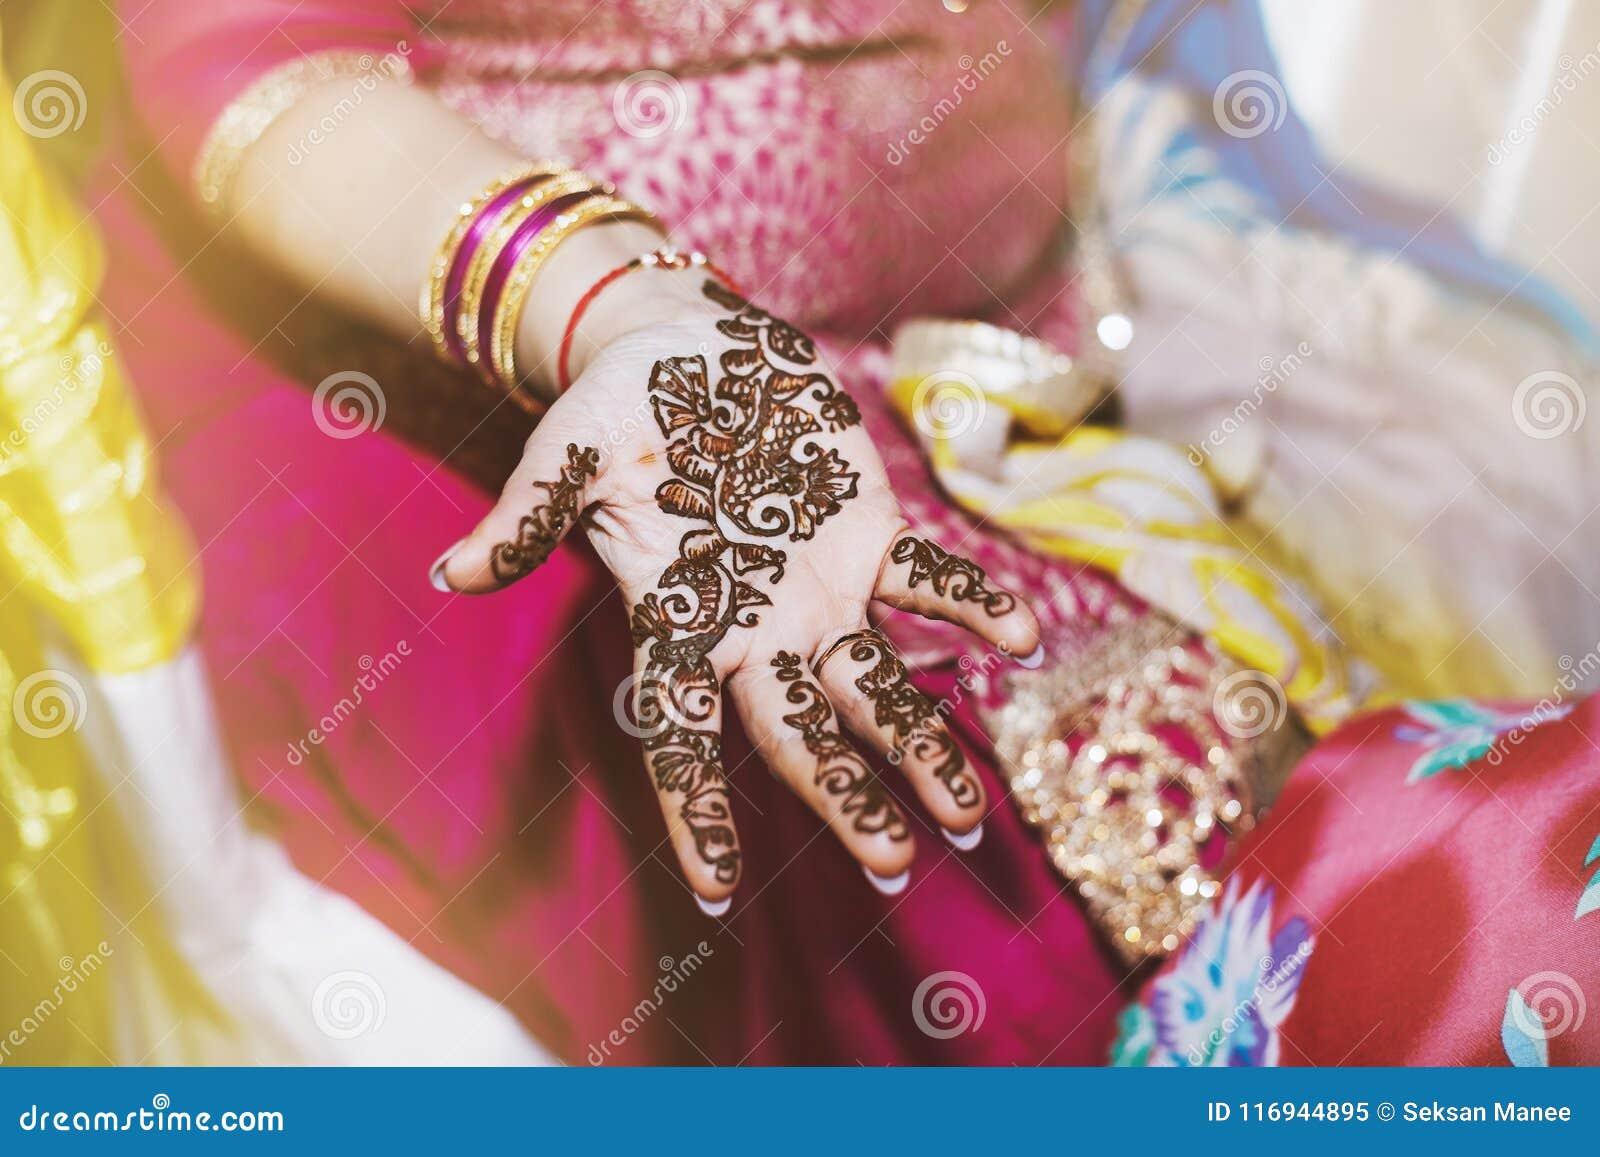 Indian Women Showing Beautiful Art Henna Mehndi Design On Hand Stock